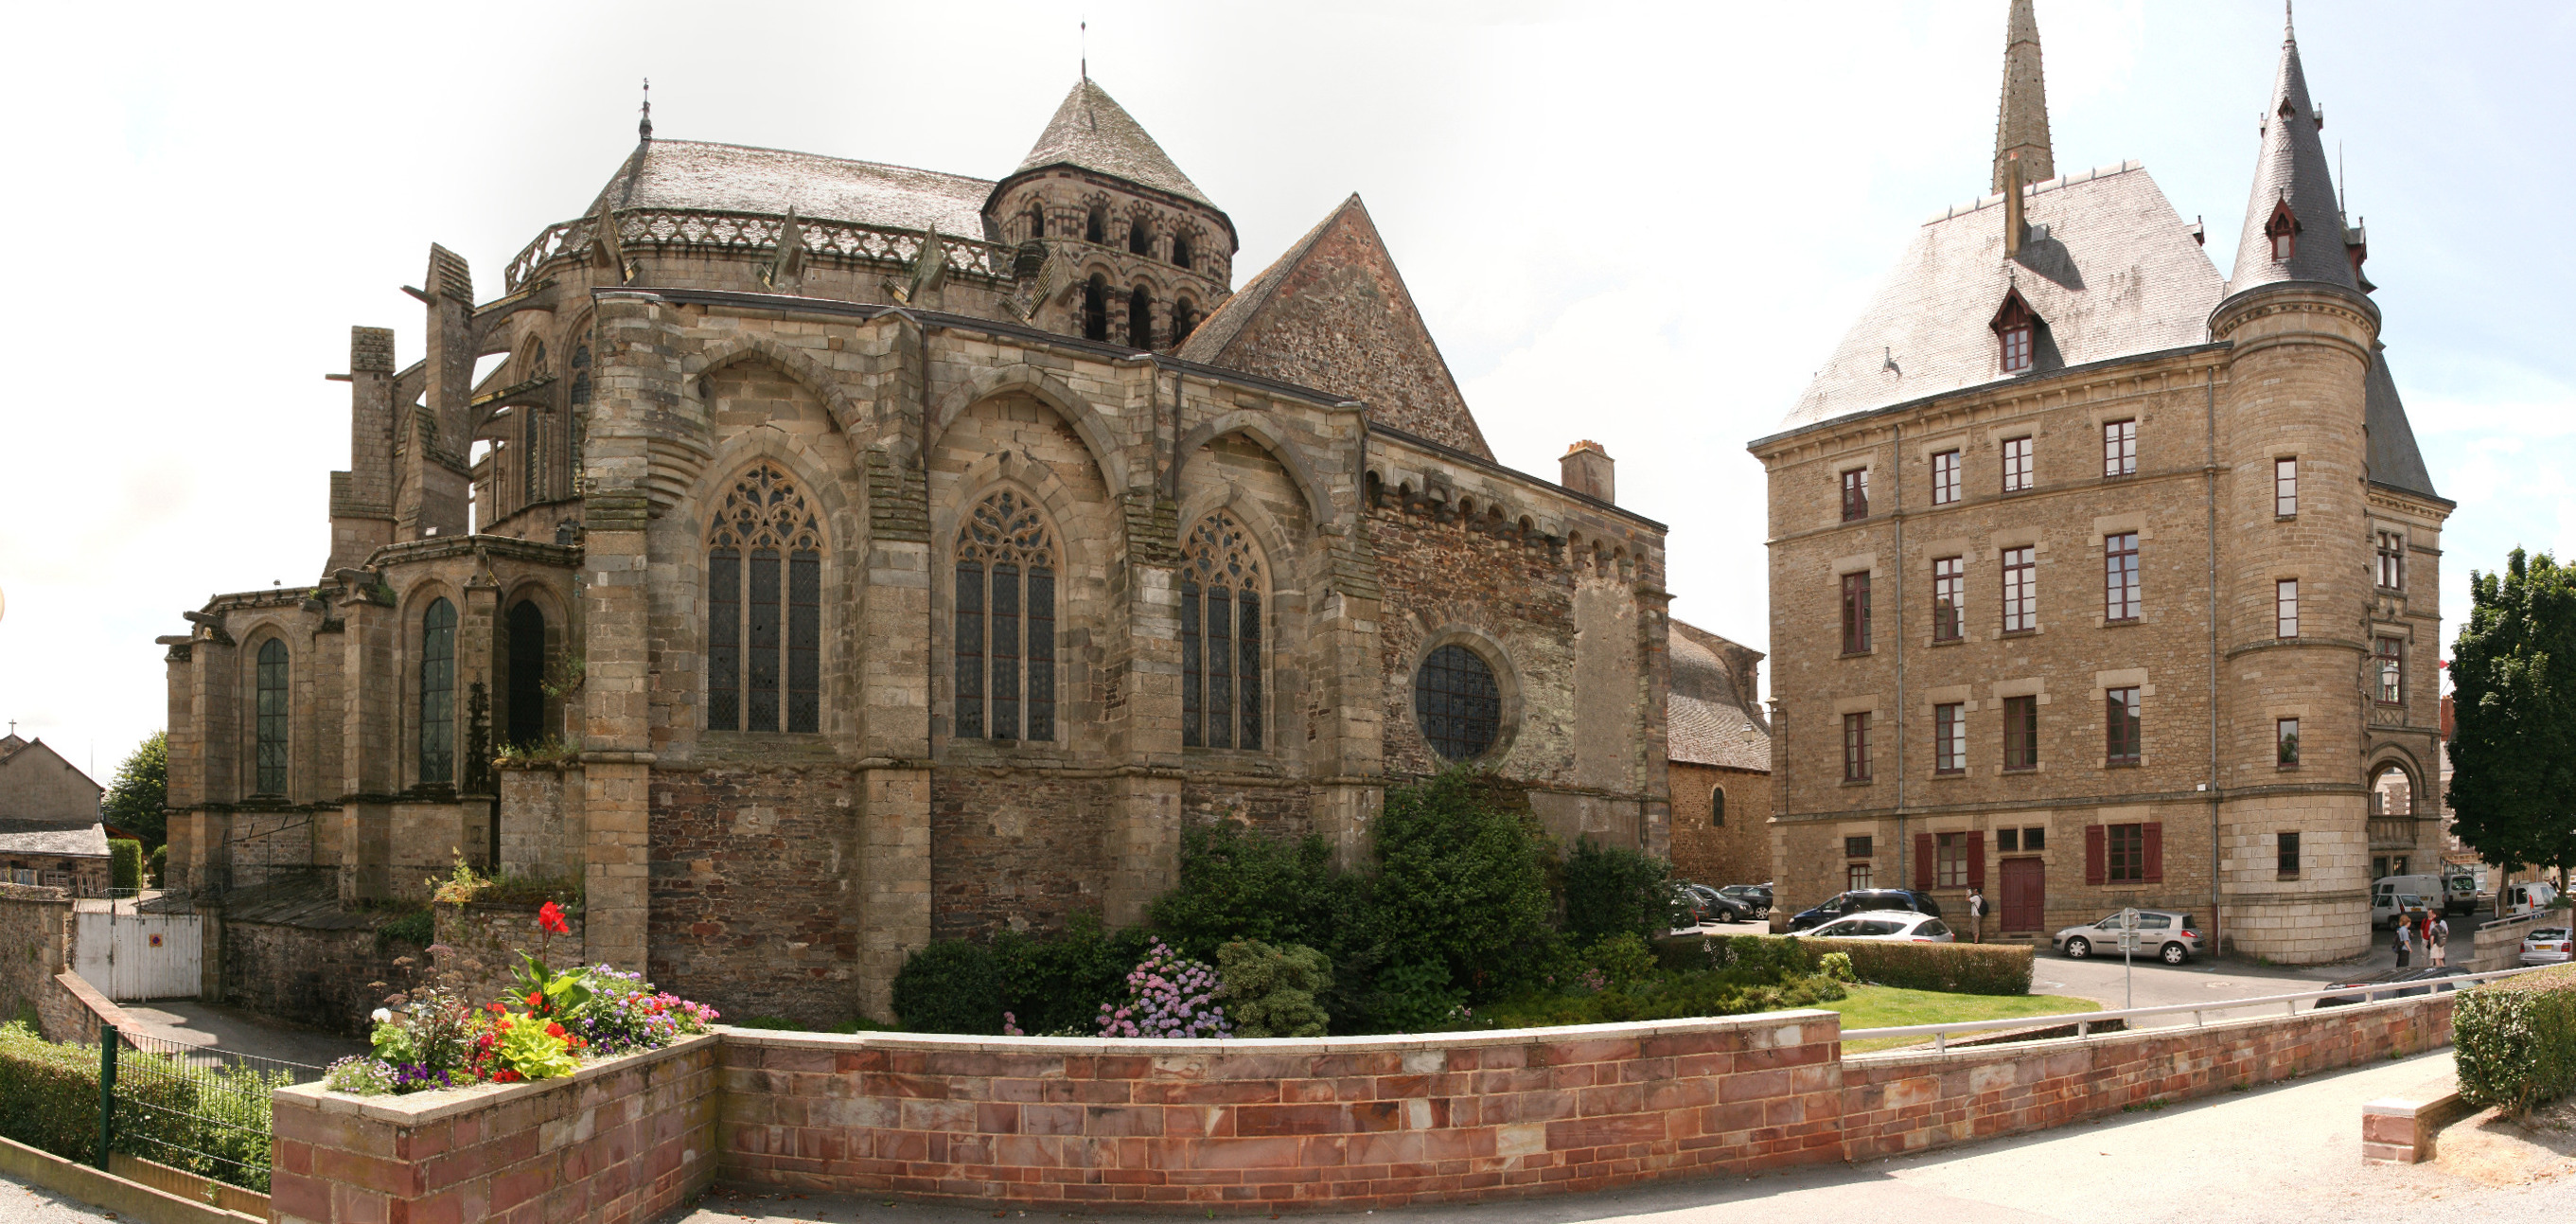 Alan IV, Duke of Brittany